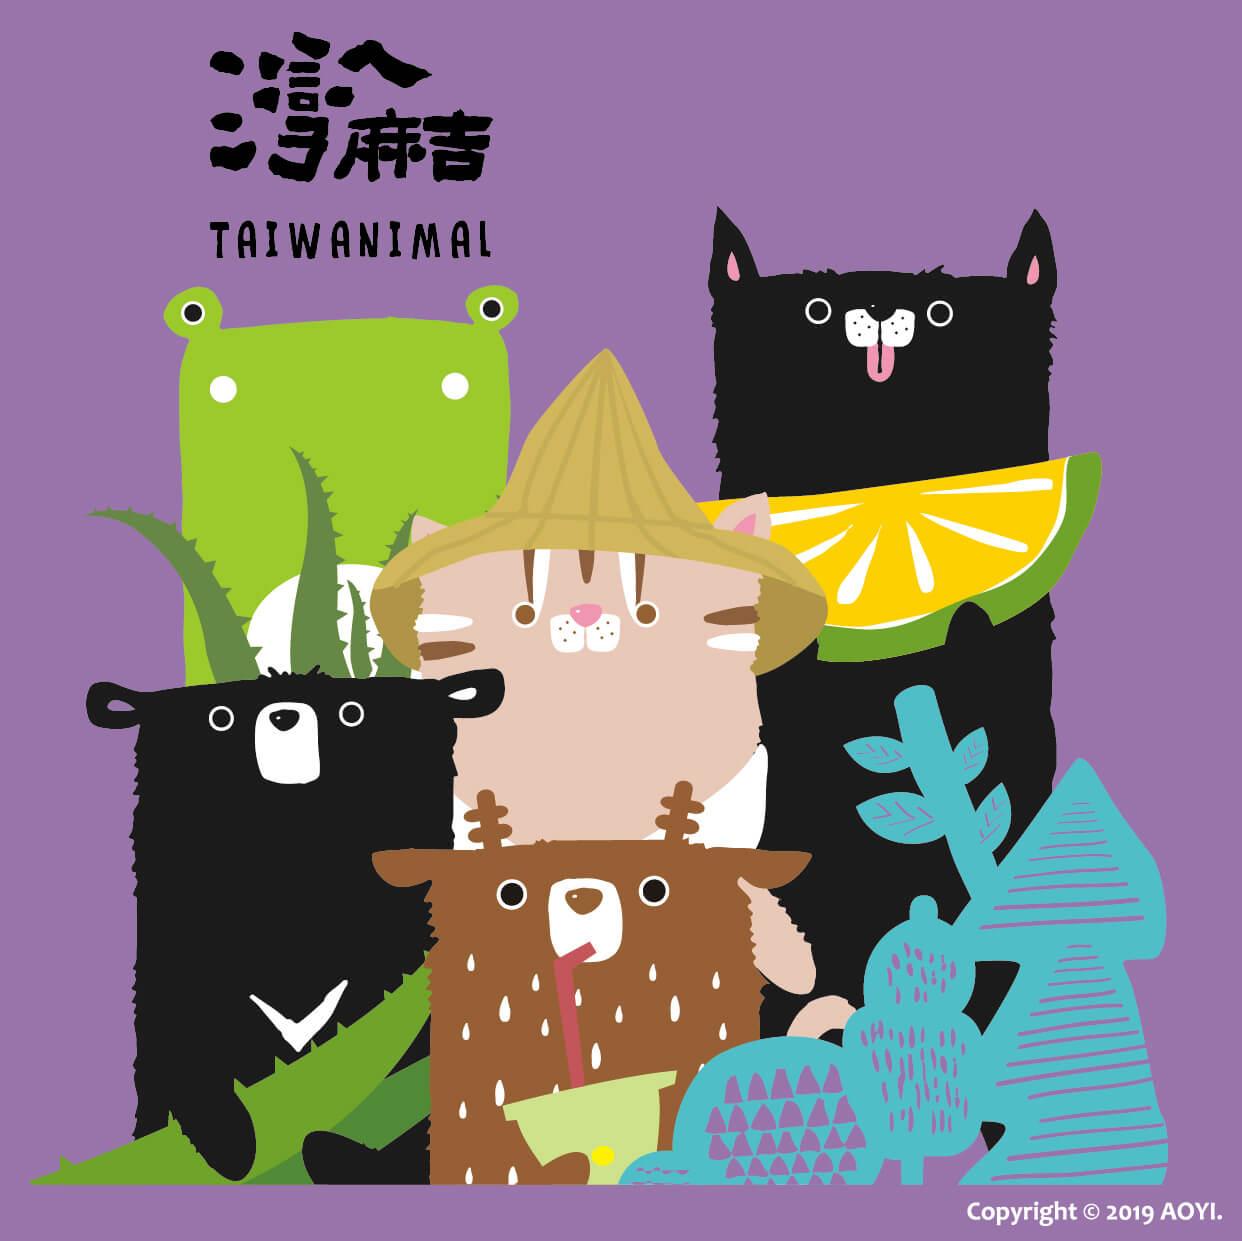 taiwanimal-%e3%82%bf%e3%82%a4%e3%83%af%e3%83%8b%e3%83%9e%e3%83%ab